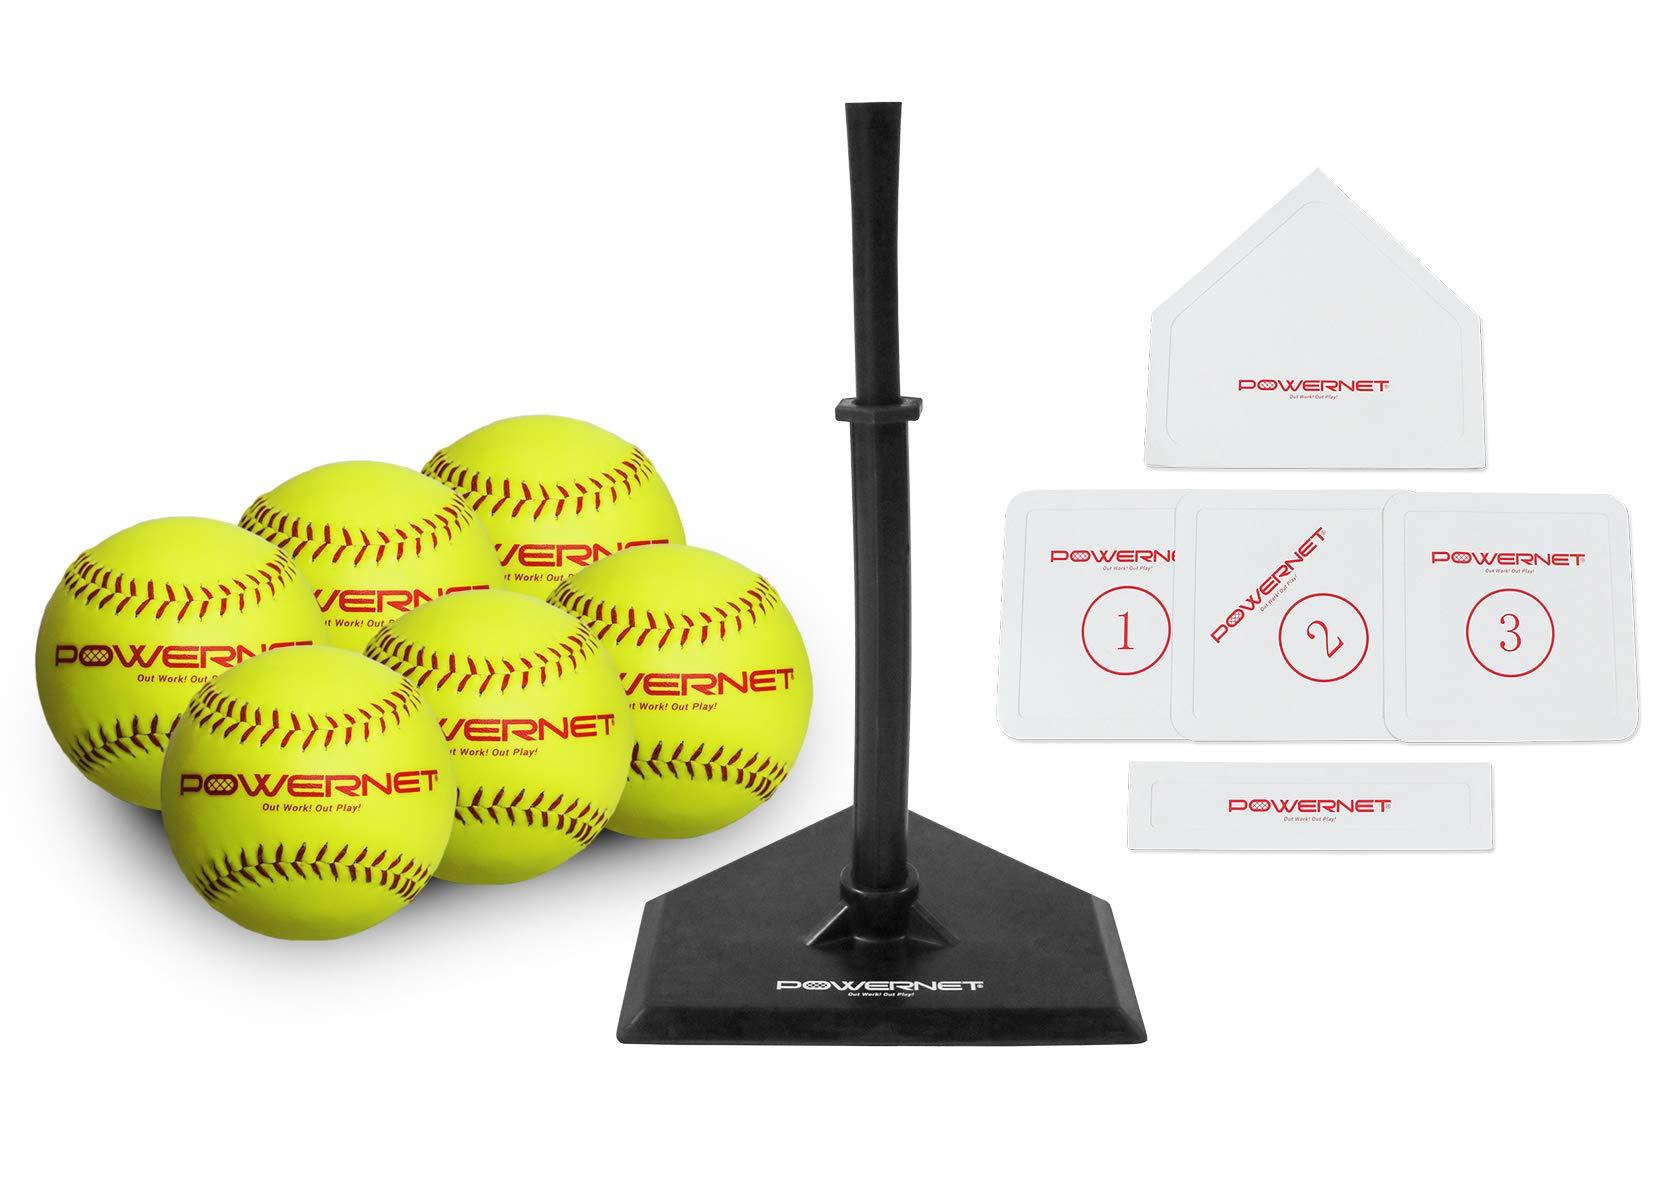 PowerNet Softball T-Ball Coaching Bundle | 8 Piece Tee-Ball Set Includes Soft Core Softballs, Adjustable Tee, Throw Down Bases to Coach